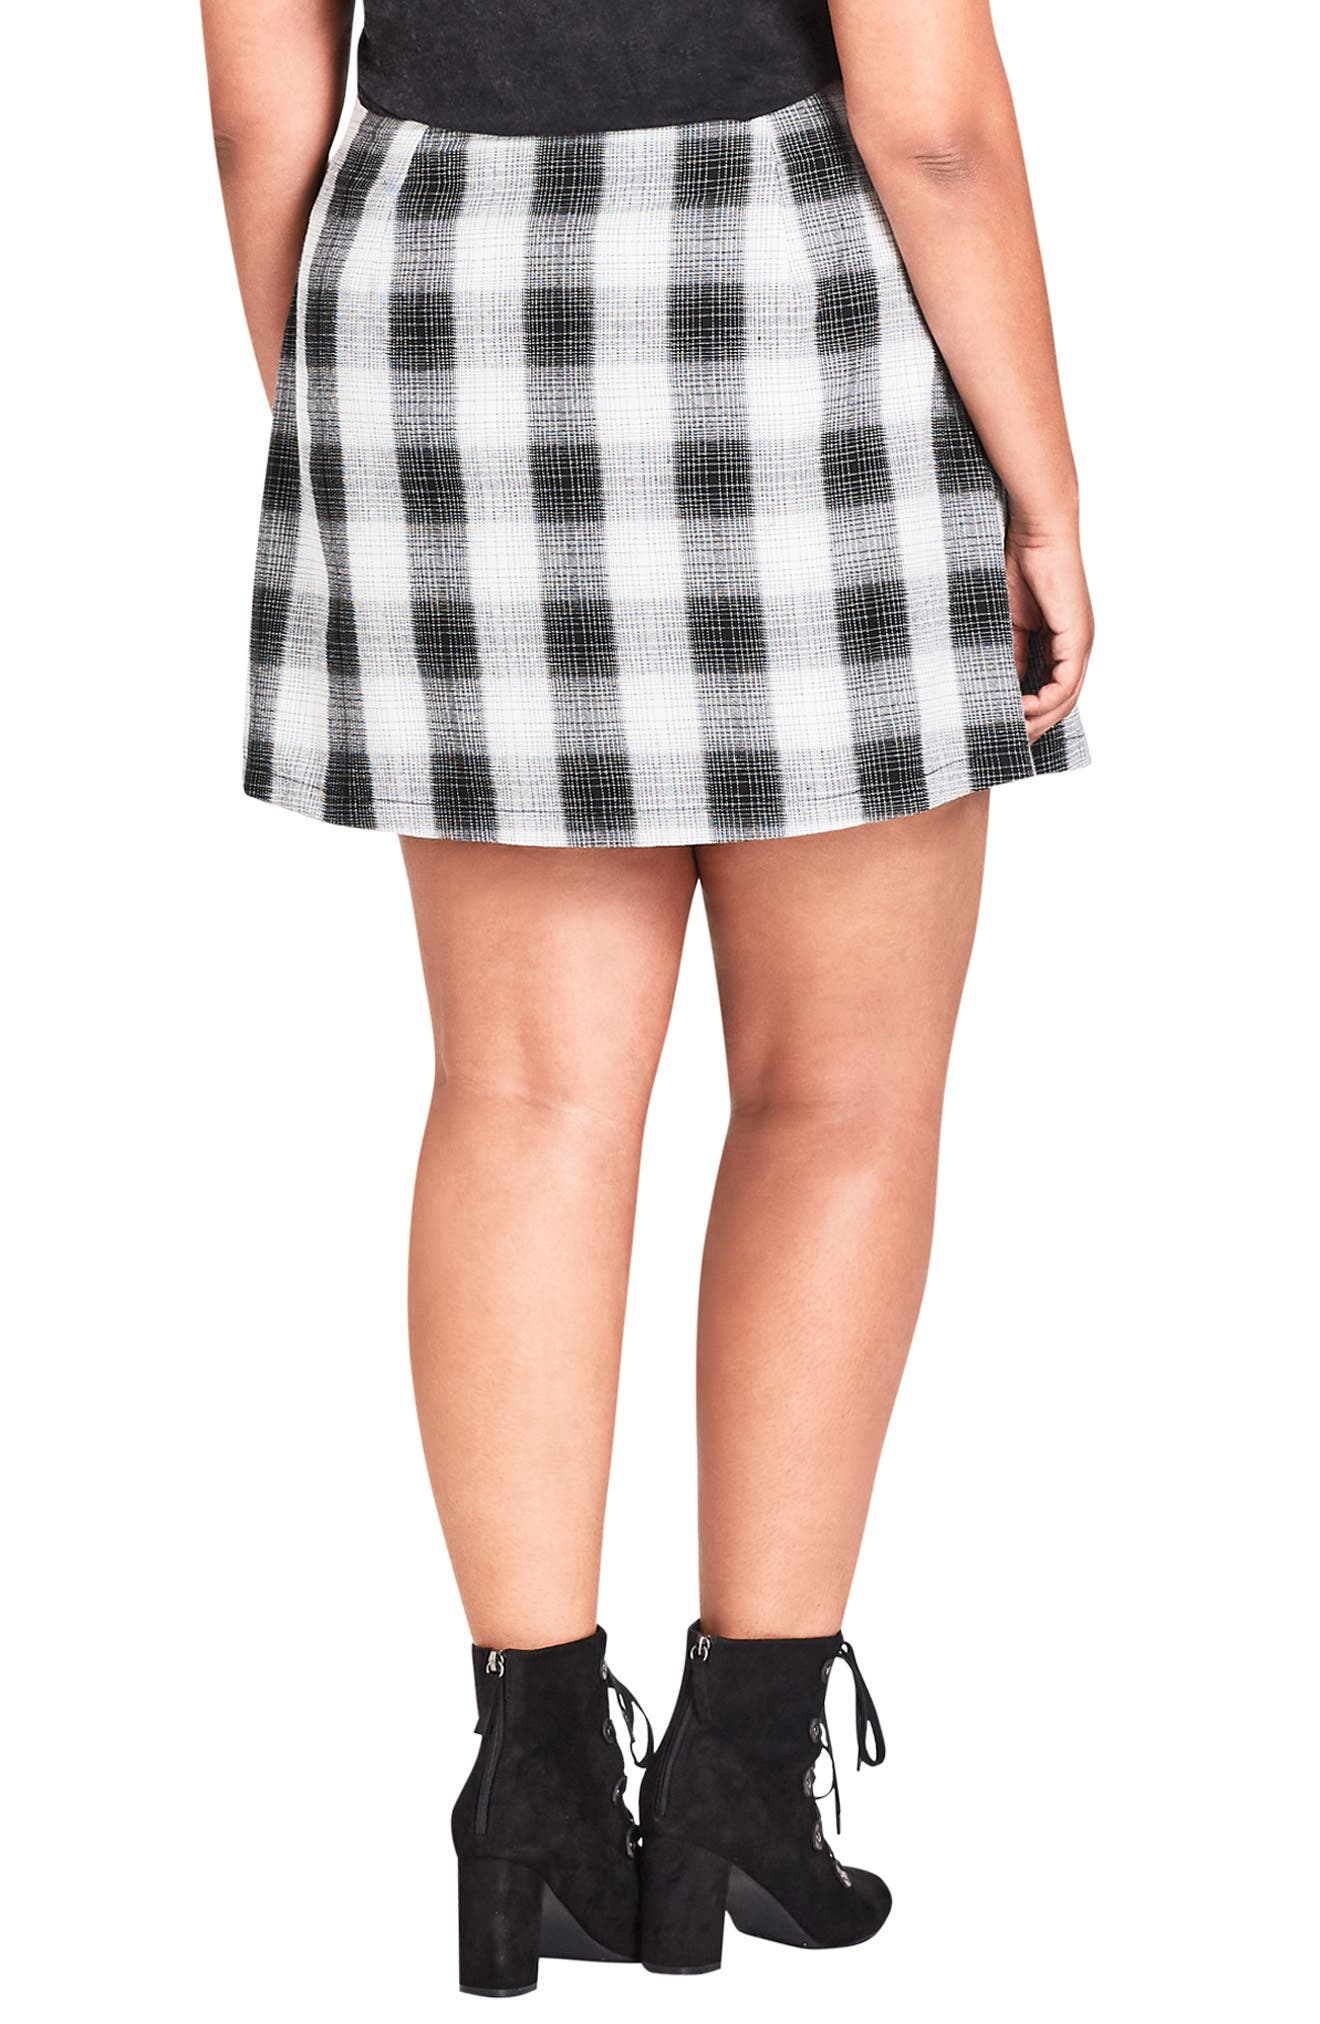 London Check A-Line Skirt,                             Alternate thumbnail 2, color,                             CHECK